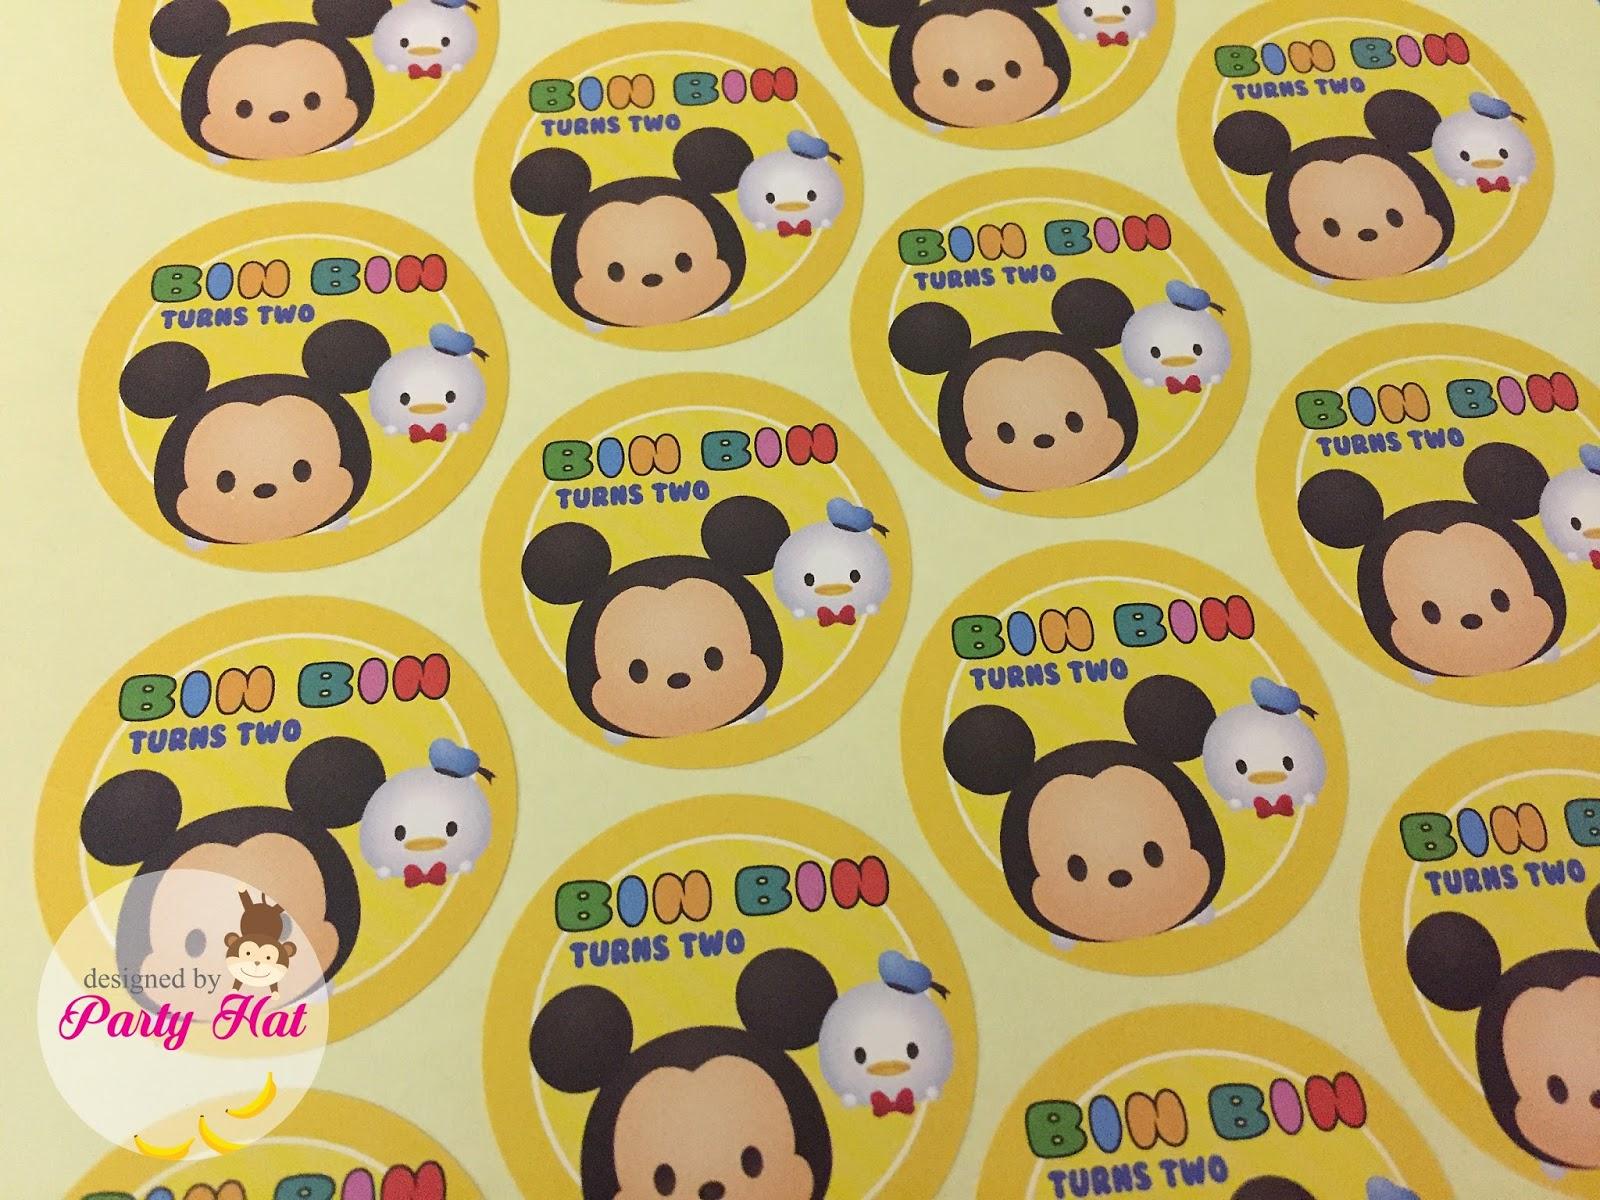 Mejores 56 Imágenes De Tsum Tsum Party En Pinterest: Party Hat: Tsum Tsum Birthday For Bin Bin